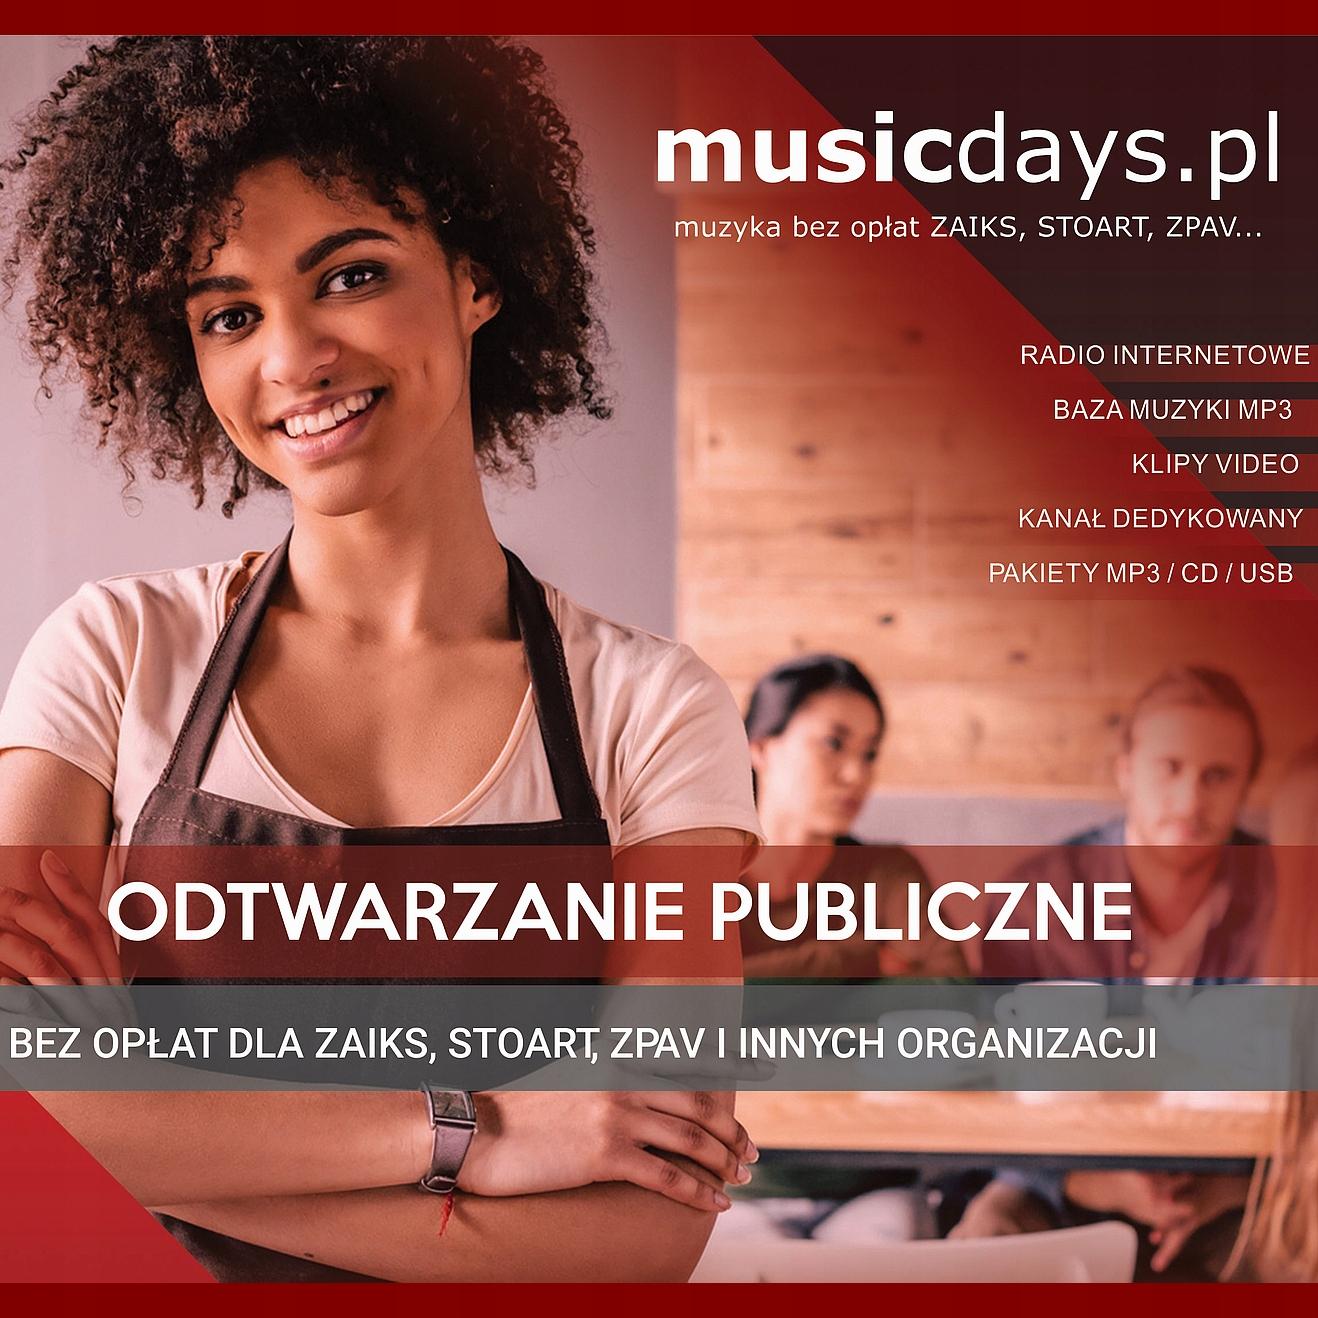 Hudba bez poplatku Zaiks - 3 albumy Chill 6 MP3 + USB